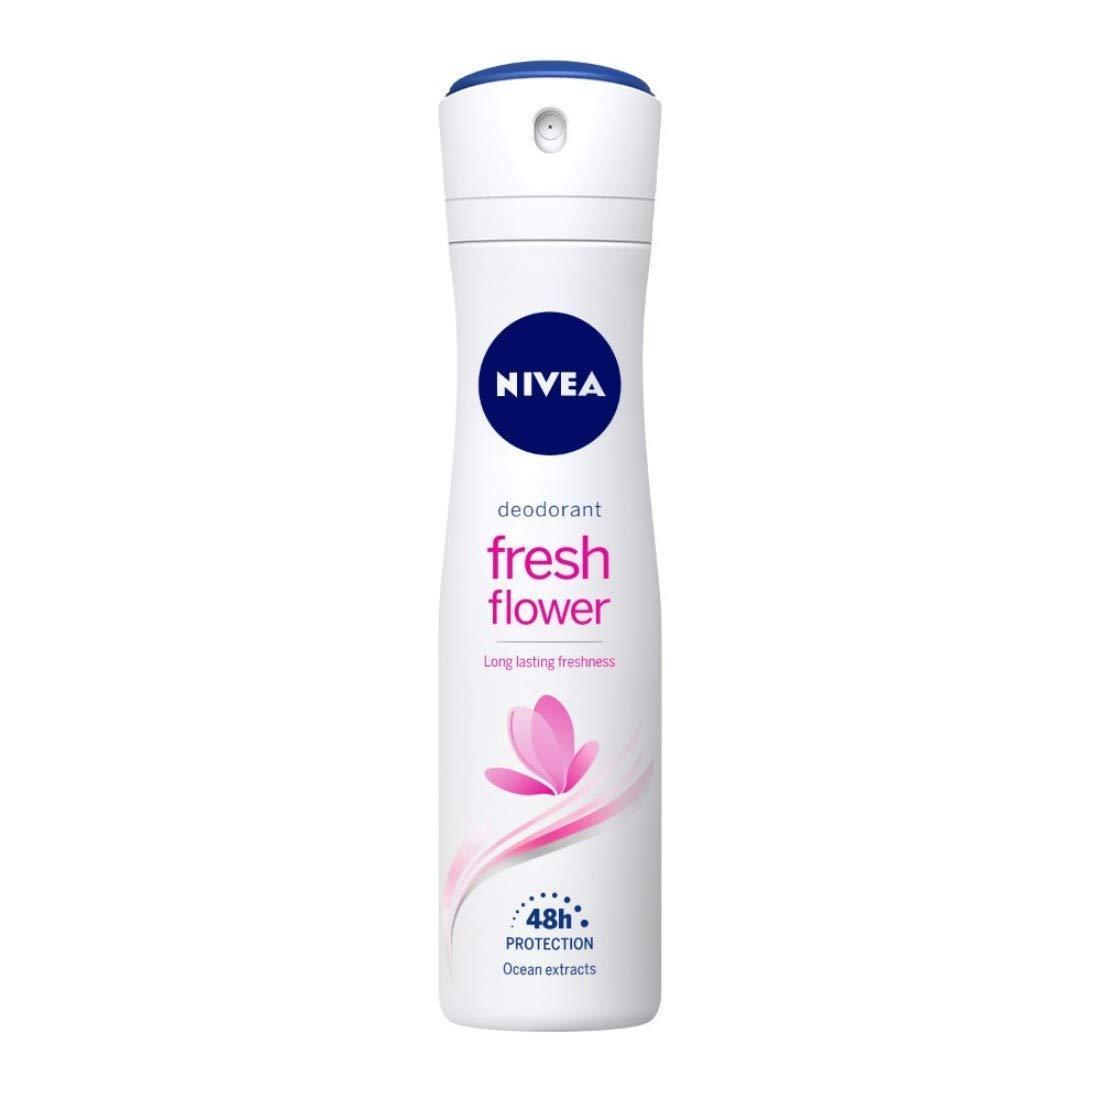 Deodorant To Get Rid Of Sweaty Underarms